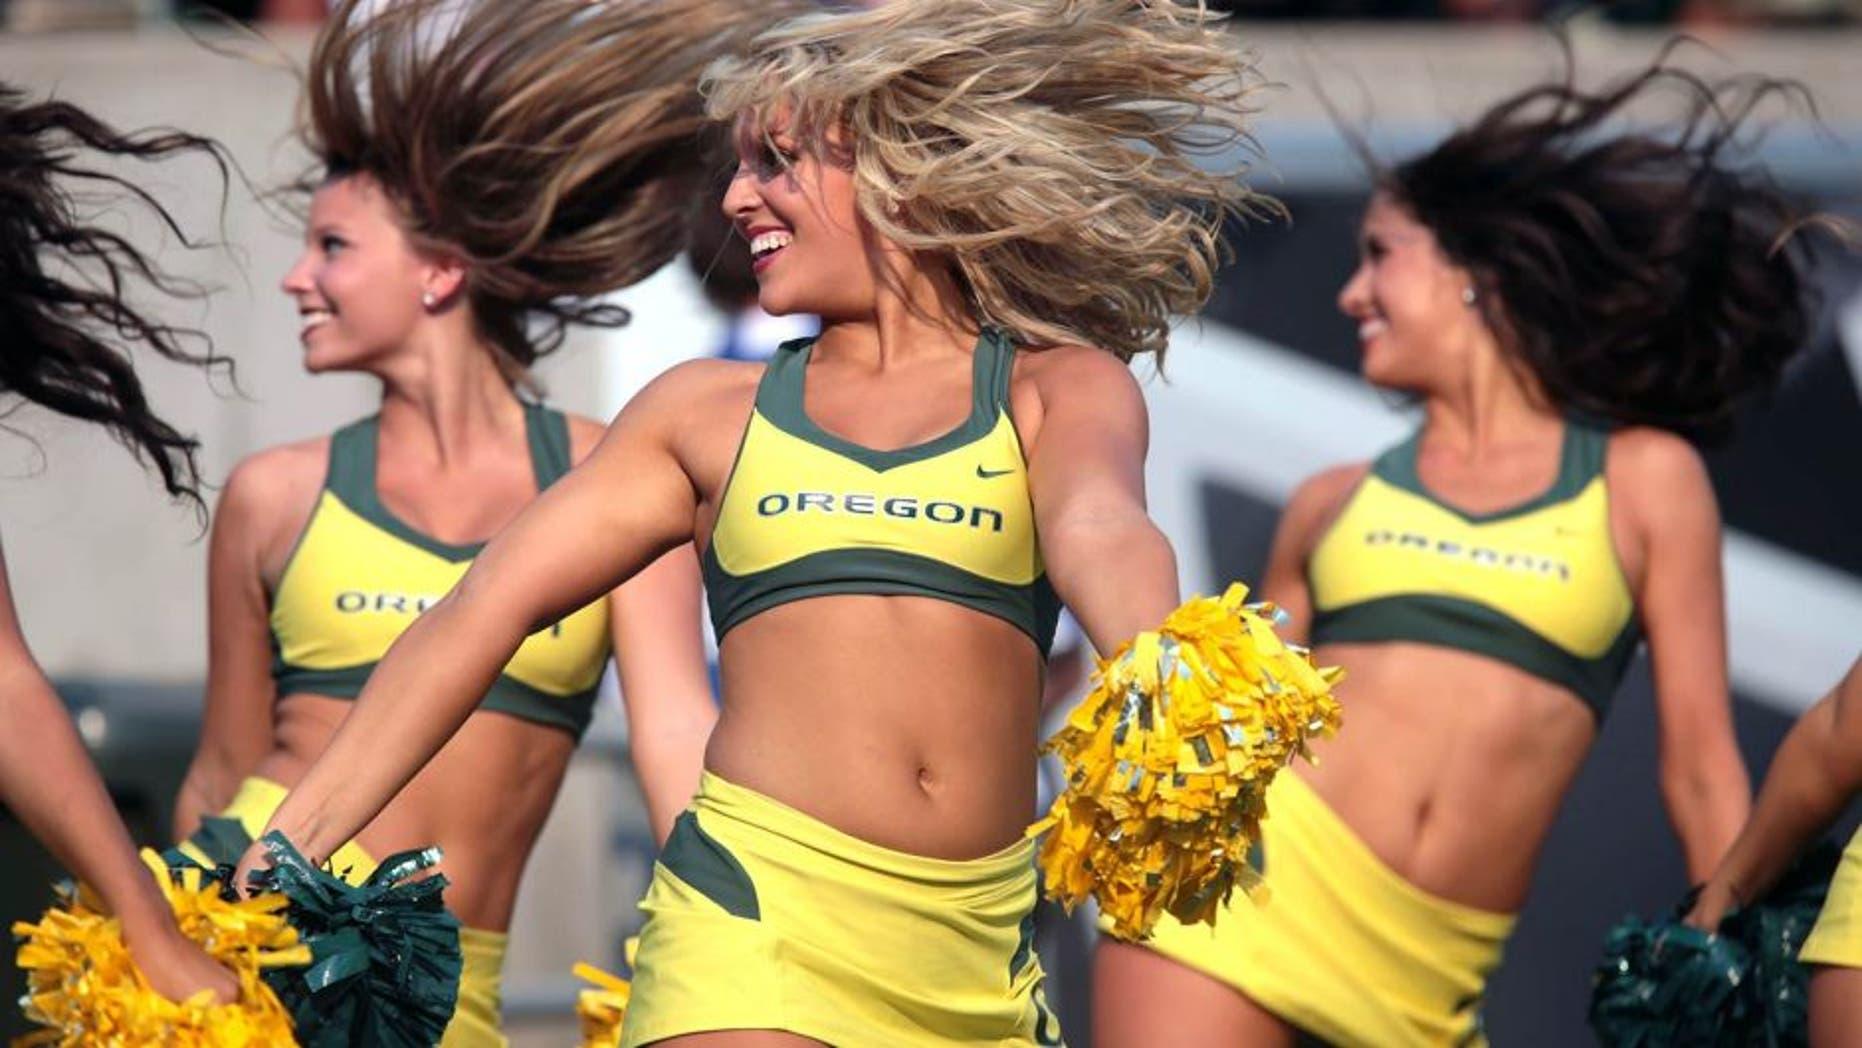 Sep 6, 2014; Eugene, OR, USA; Oregon Ducks cheerleaders preform against the Michigan State Spartans at Autzen Stadium. Mandatory Credit: Scott Olmos-USA TODAY Sports